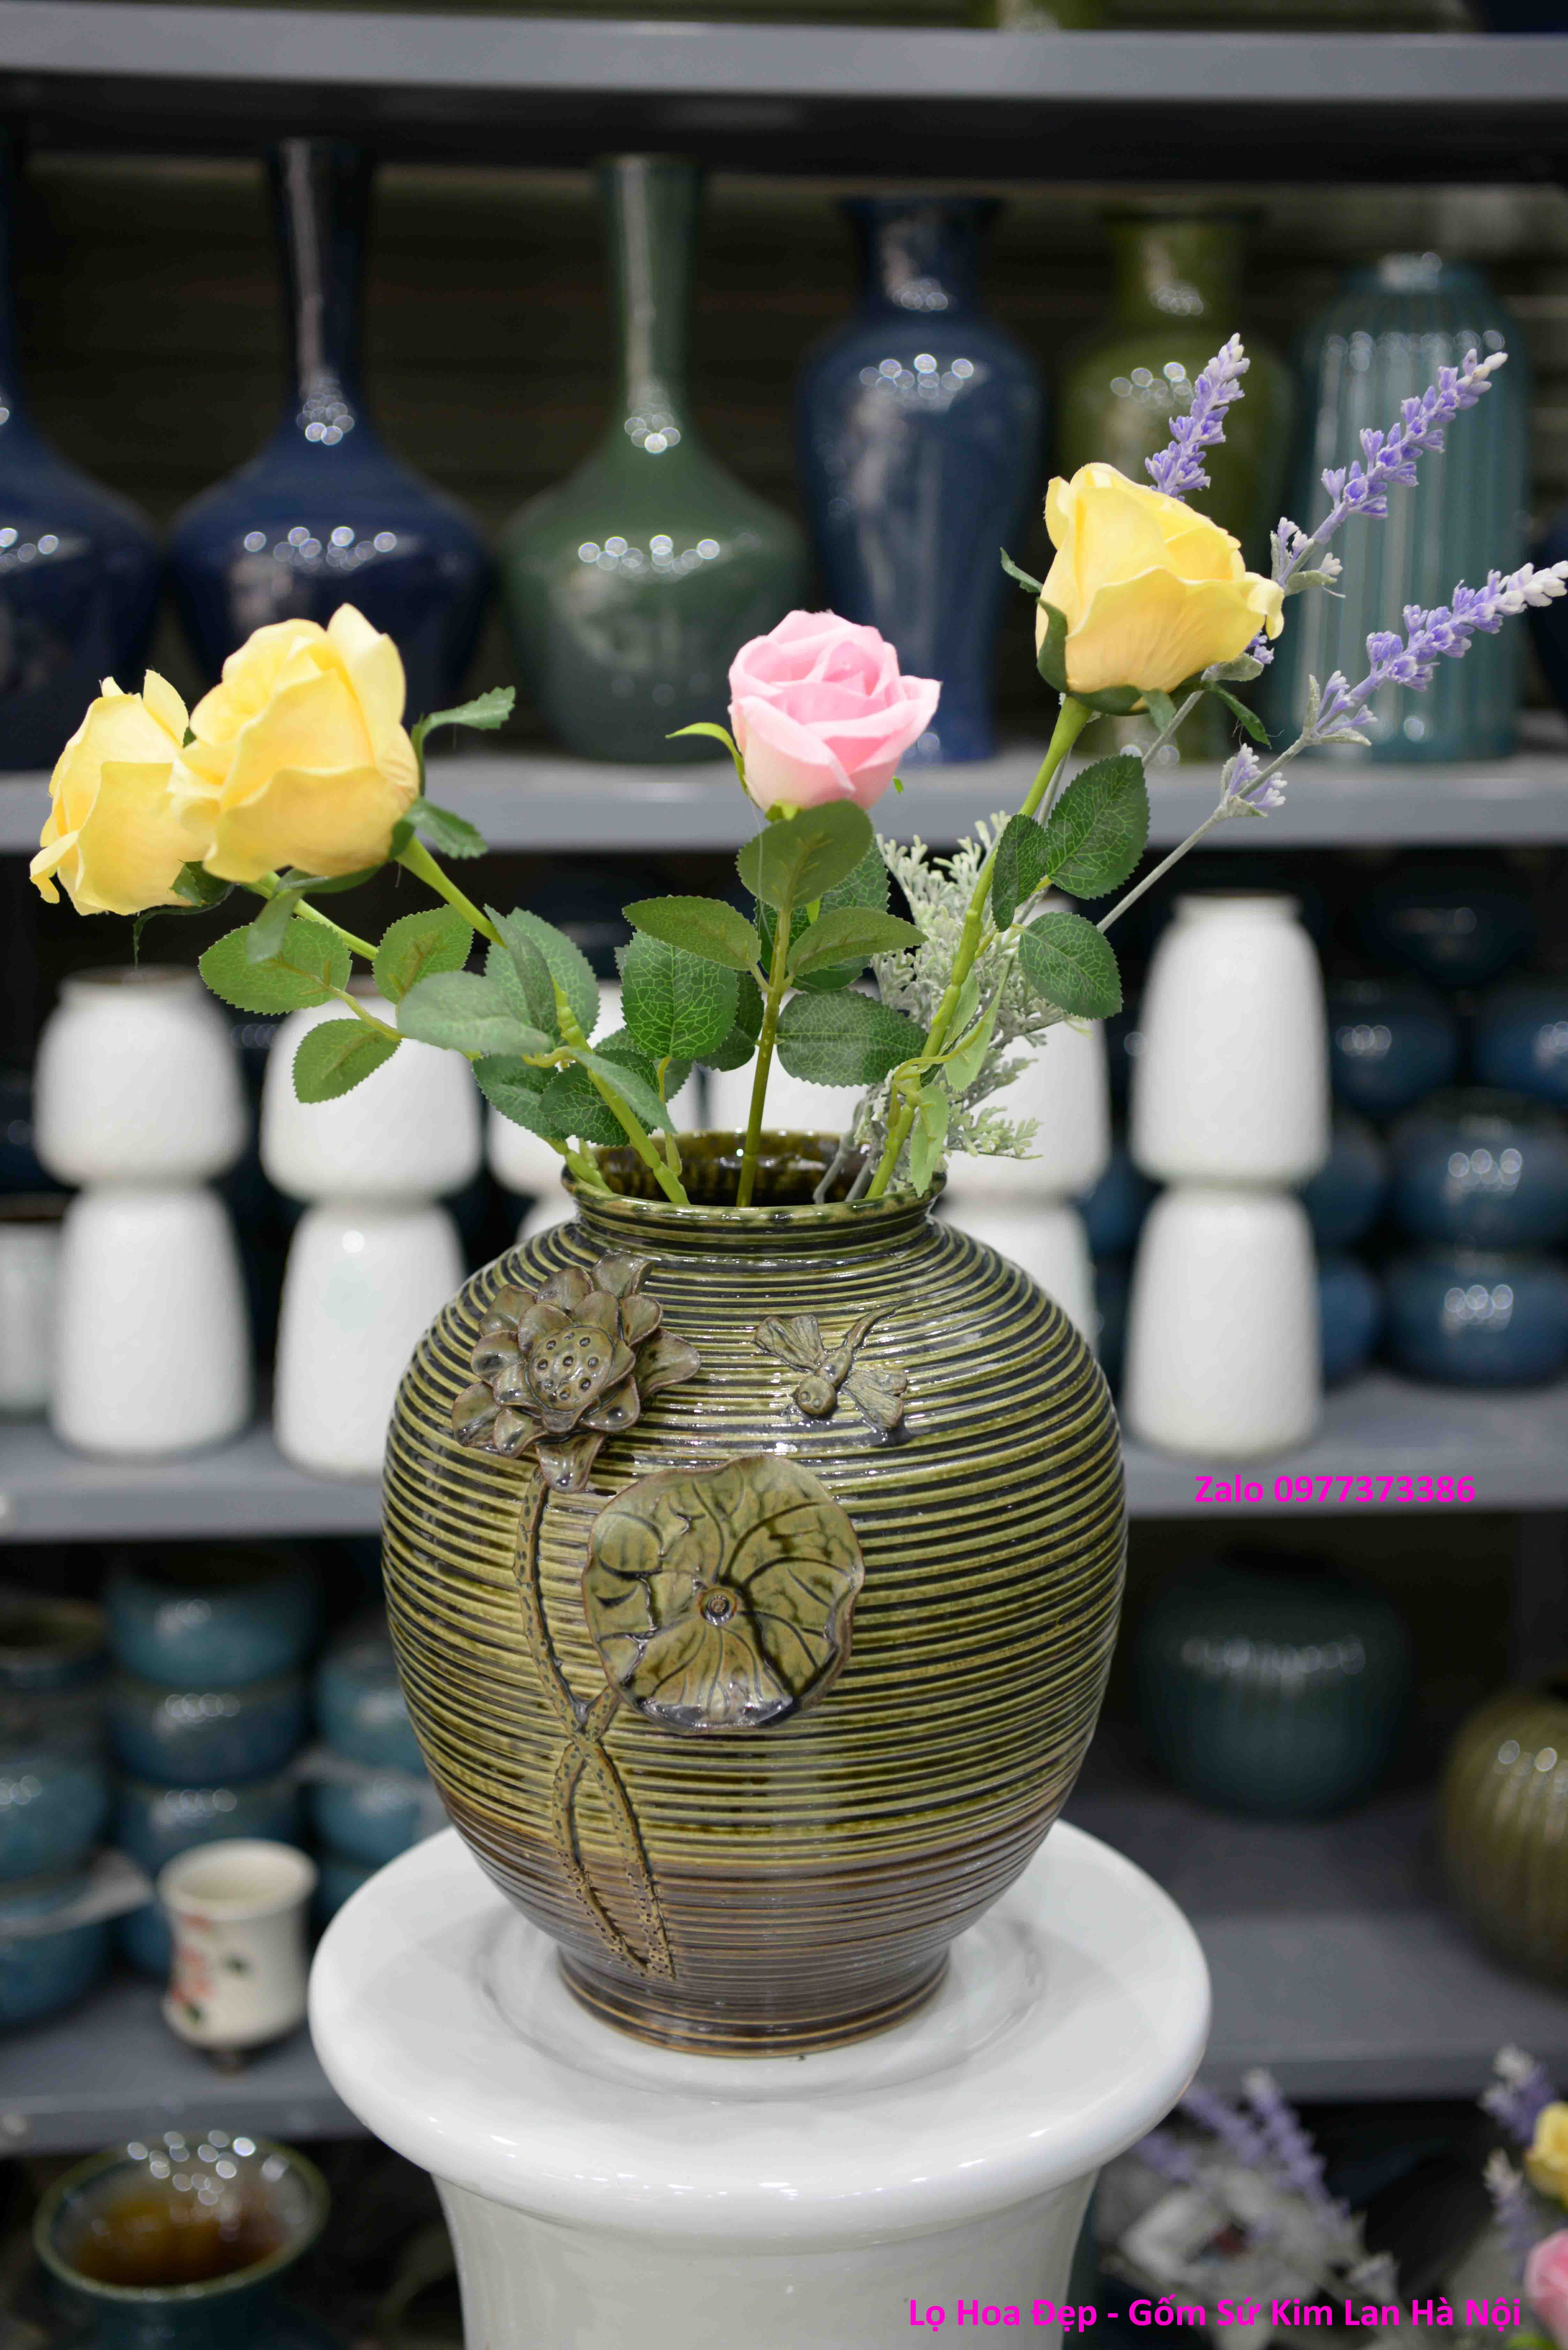 Hoa Hoa Đắp Nổi